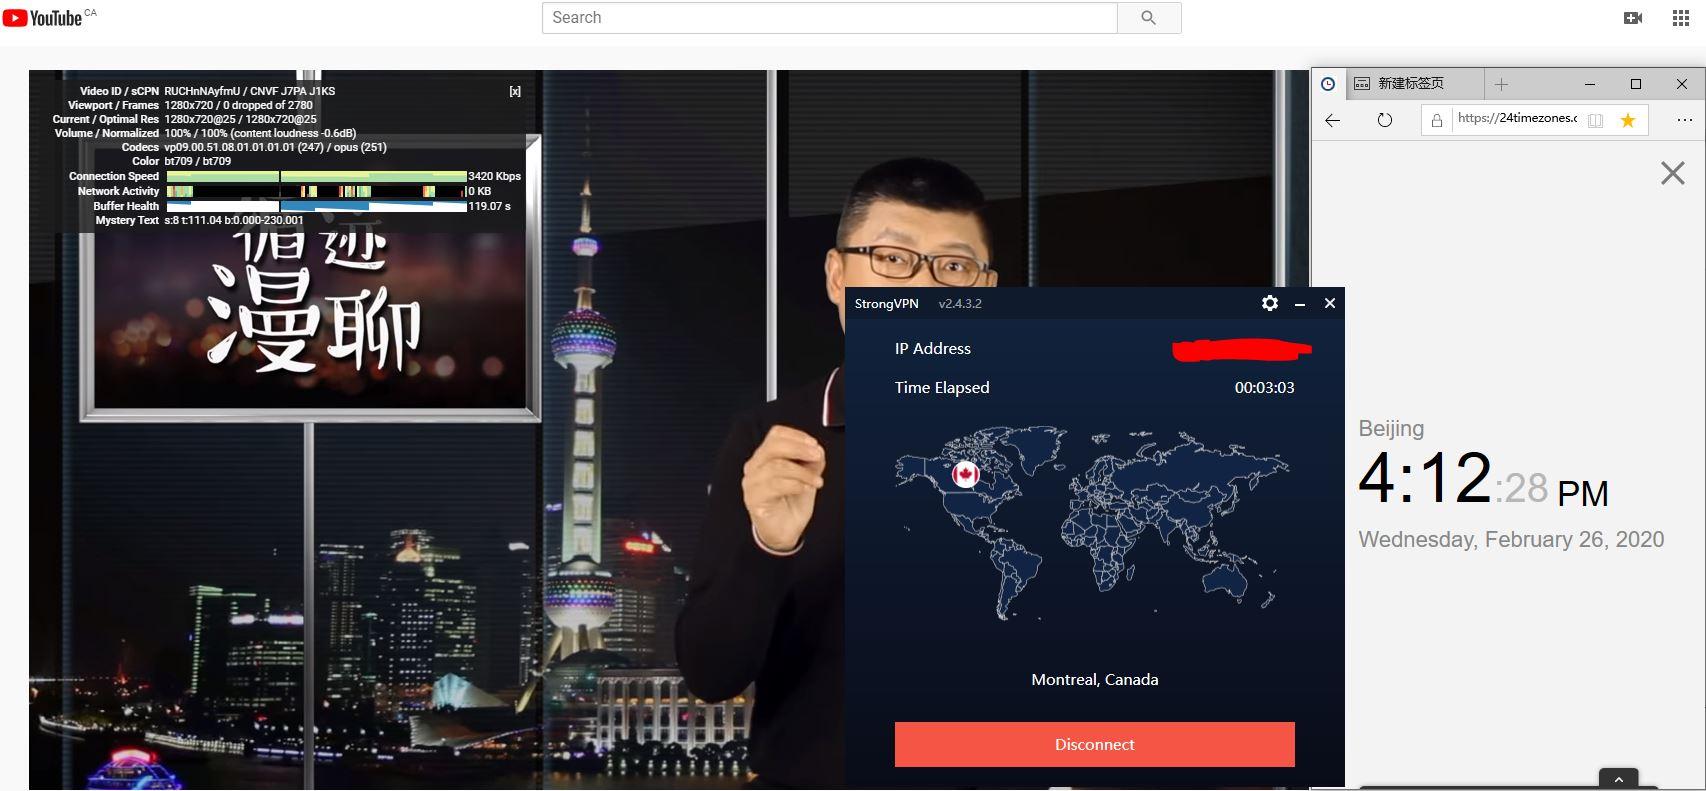 StrongVPN Windows10 Montreal Canada 中国VPN翻墙 科学上网 Youtube测速-20200226